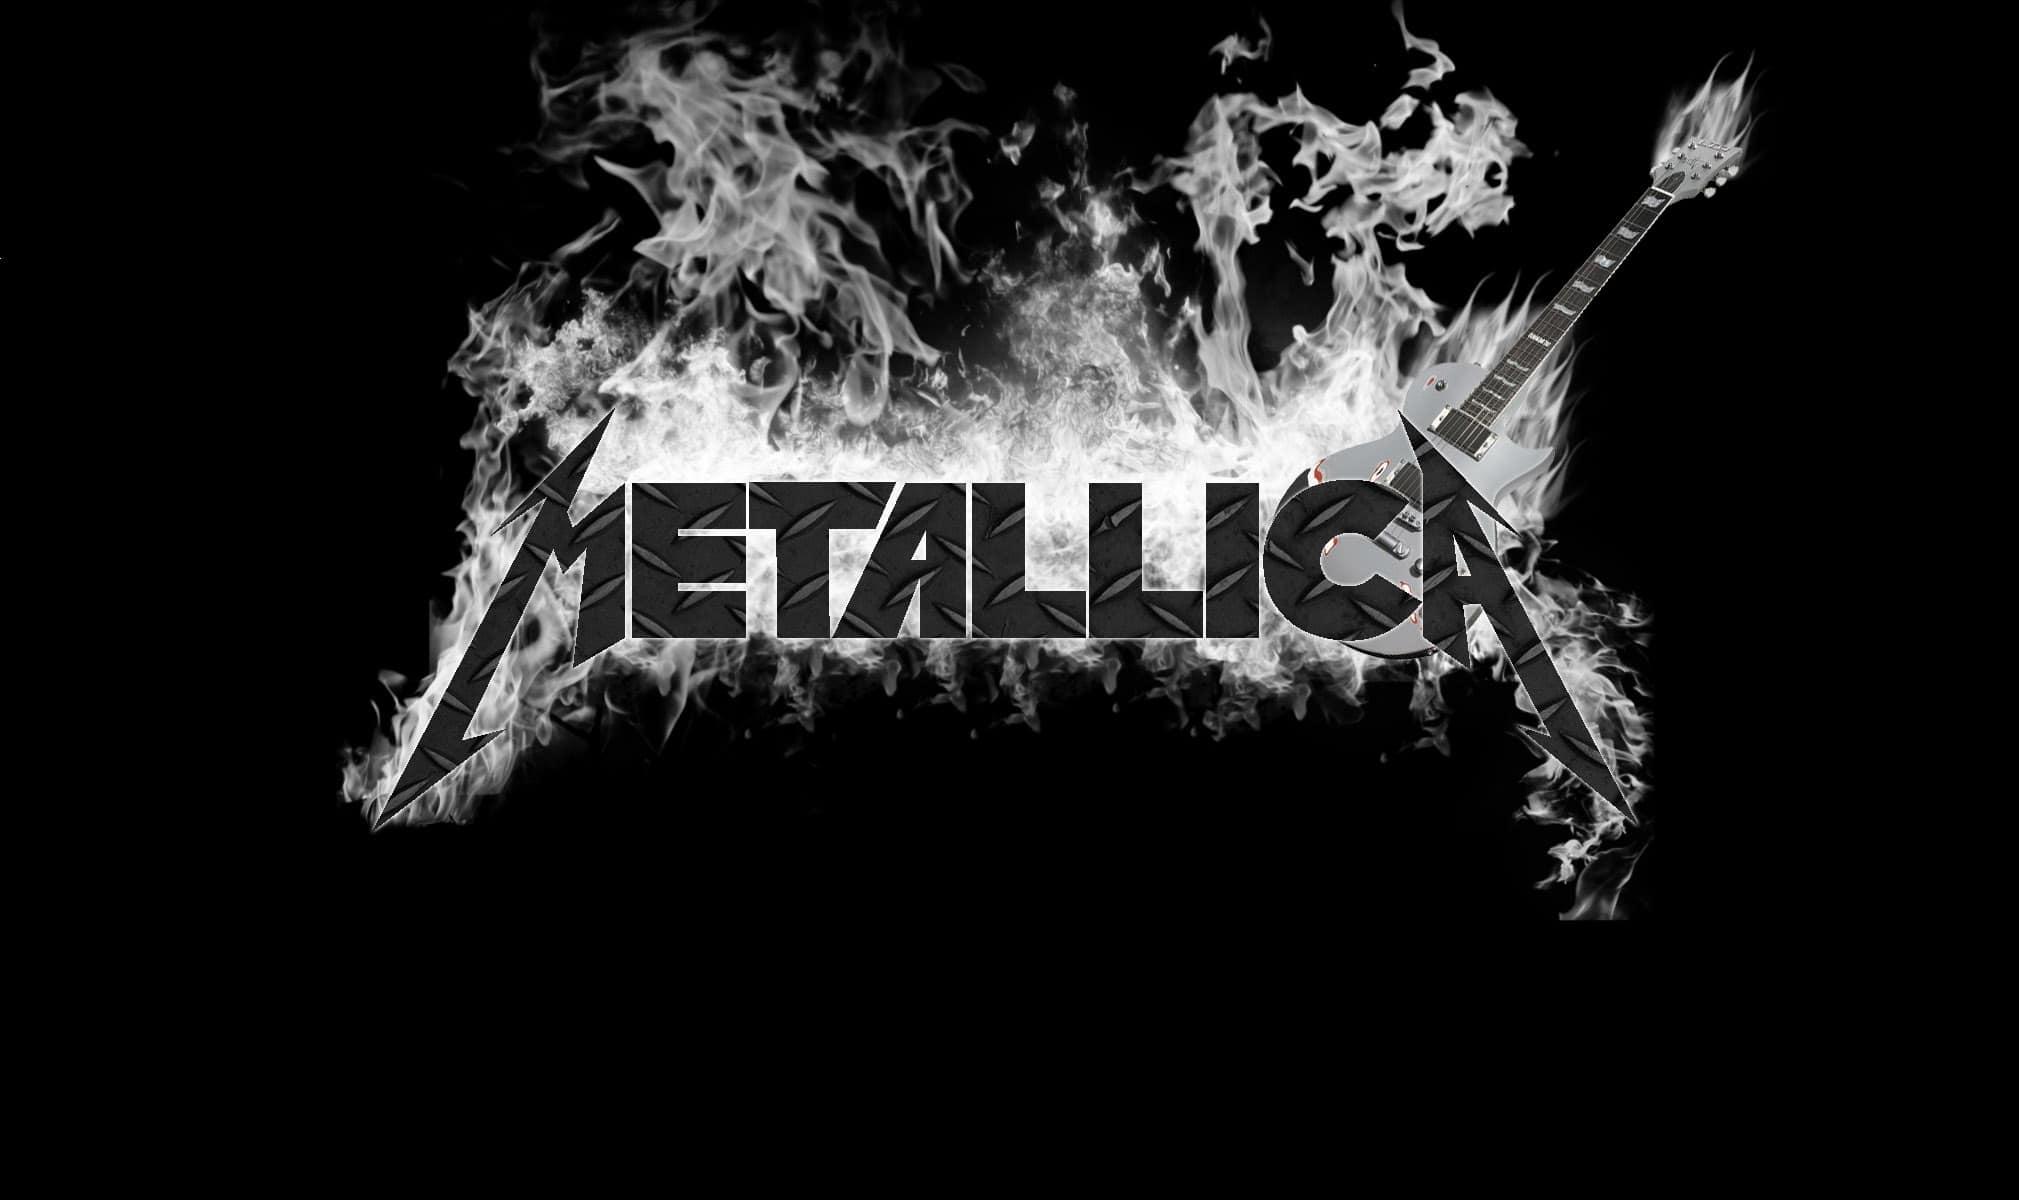 Metallica Screensavers